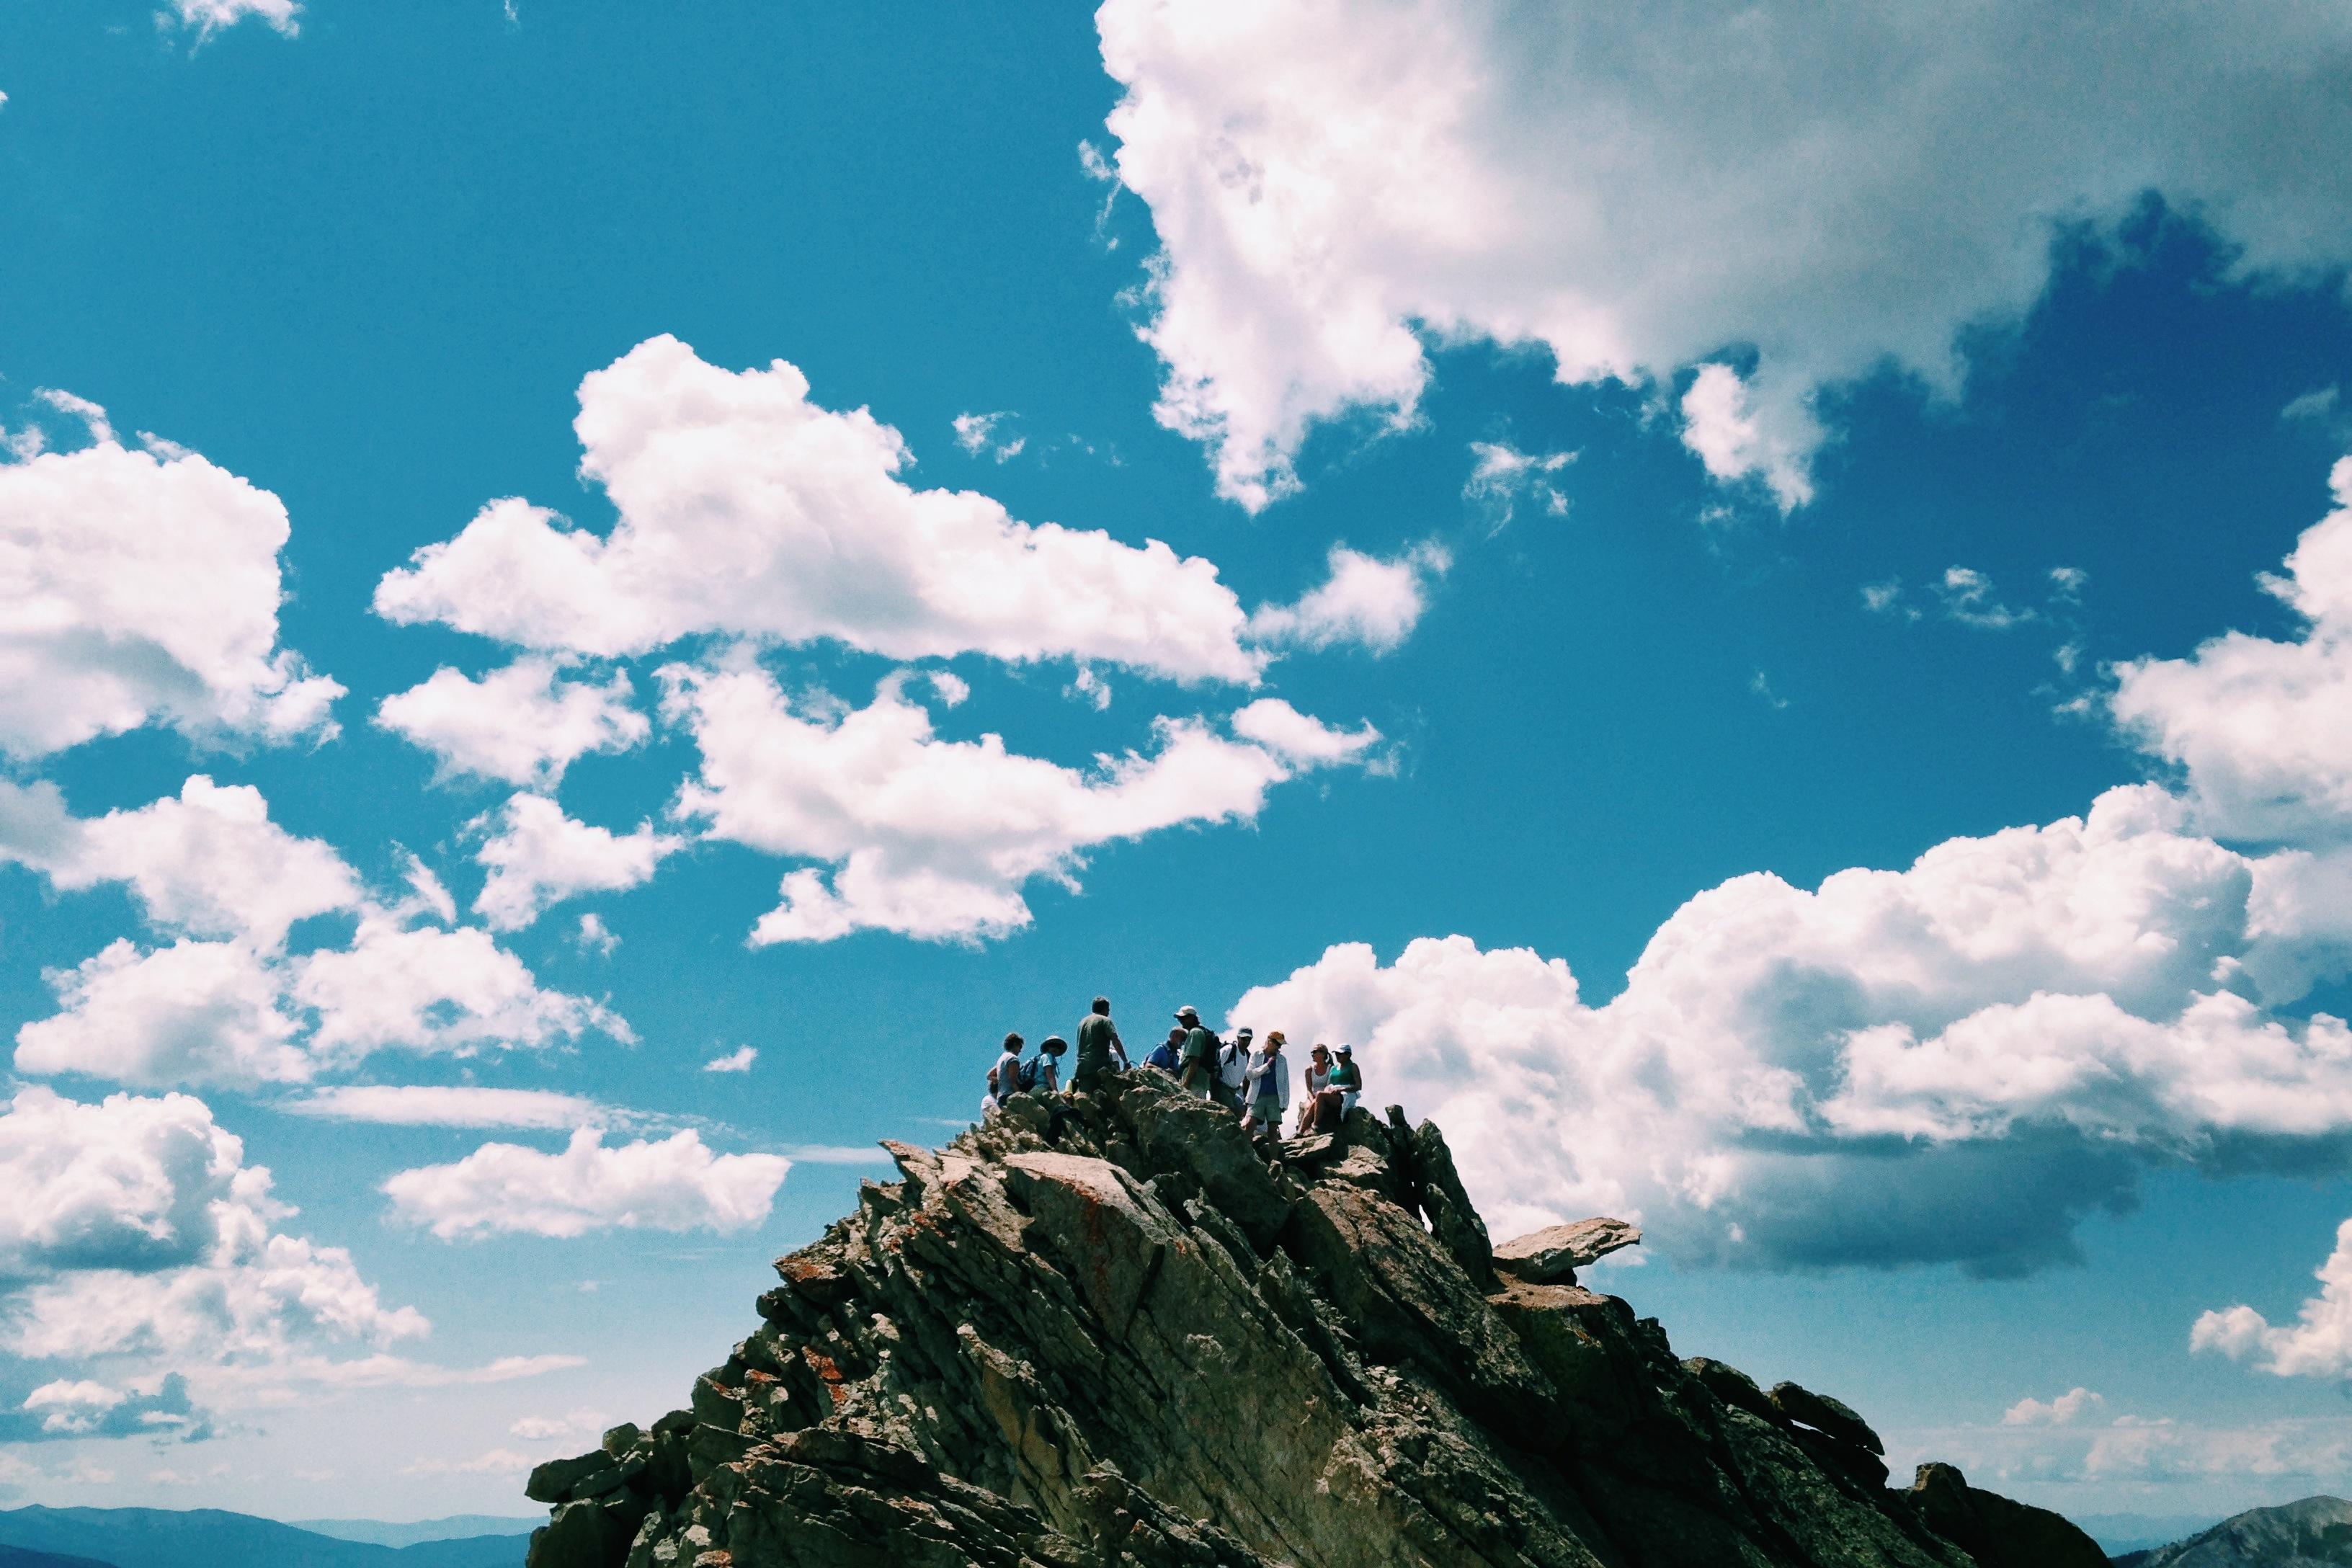 Beautiful Wallpaper Mountain Aesthetic - nature-horizon-mountain-cloud-group-people-sky-hiking-sunlight-hill-adventure-mountain-range-summer-cumulus-climbing-trip-blue-sky-sunny-clouds-expedition-exploration-hd-wallpaper-meteorological-phenomenon-mountainous-landforms-932708  2018_736617.jpg